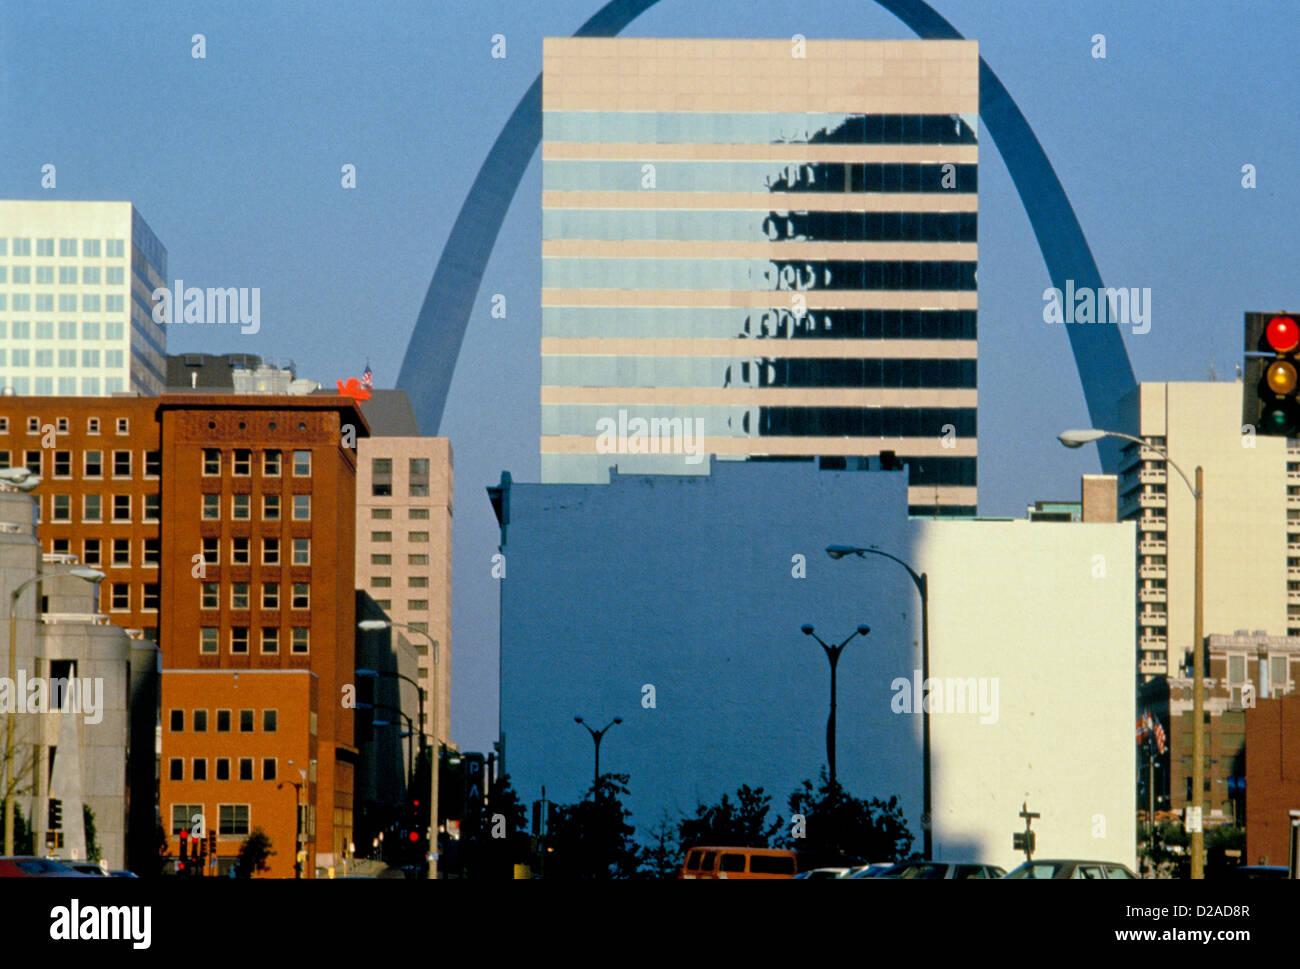 Missouri, Saint Louis, The Arch. - Stock Image